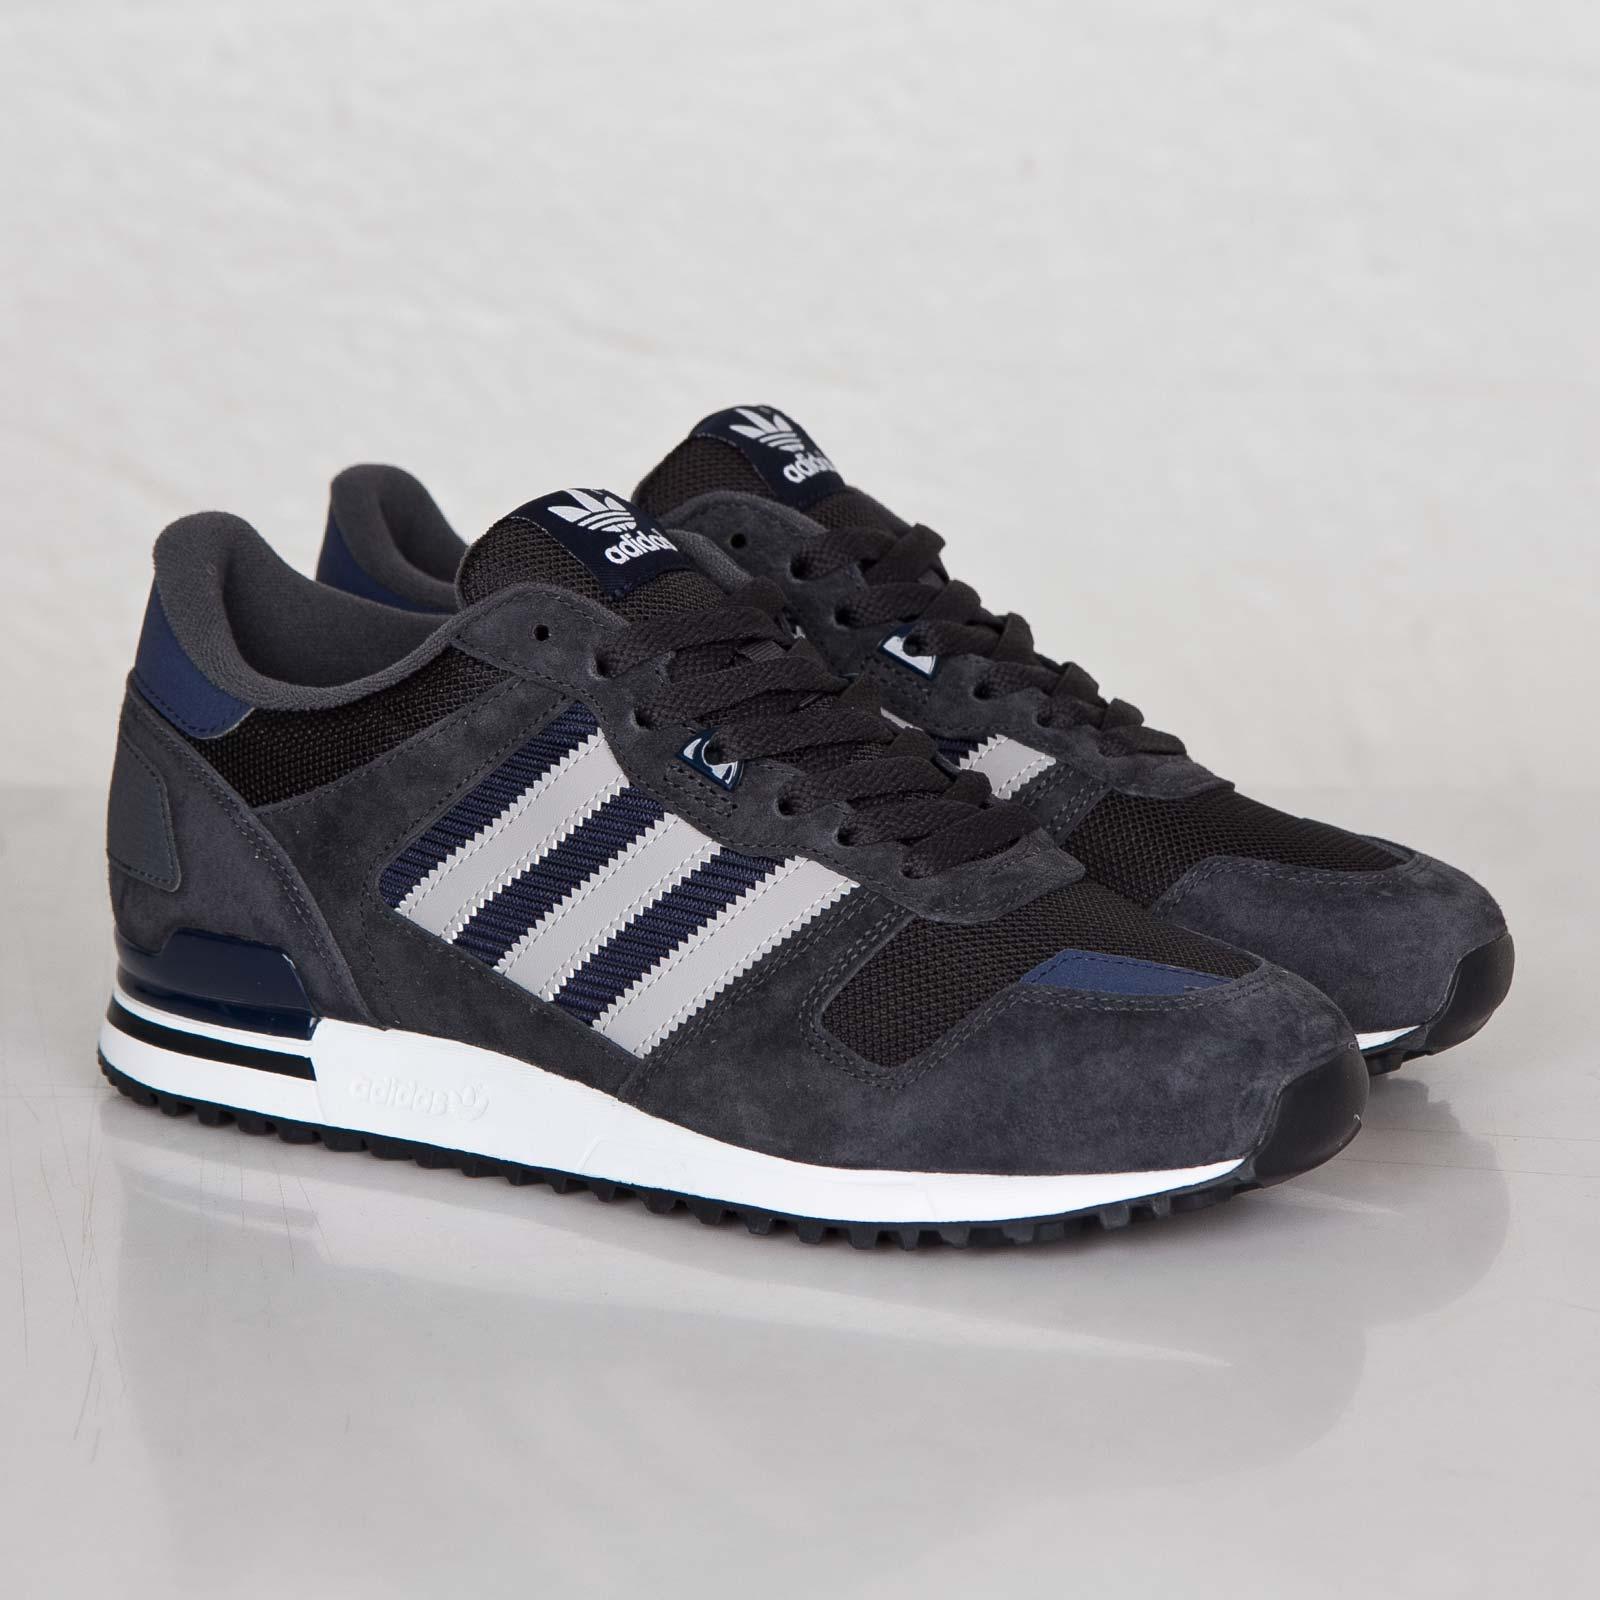 wholesale dealer c0c65 1dc3b adidas ZX 700 - M19391 - Sneakersnstuff   sneakers   streetwear ...